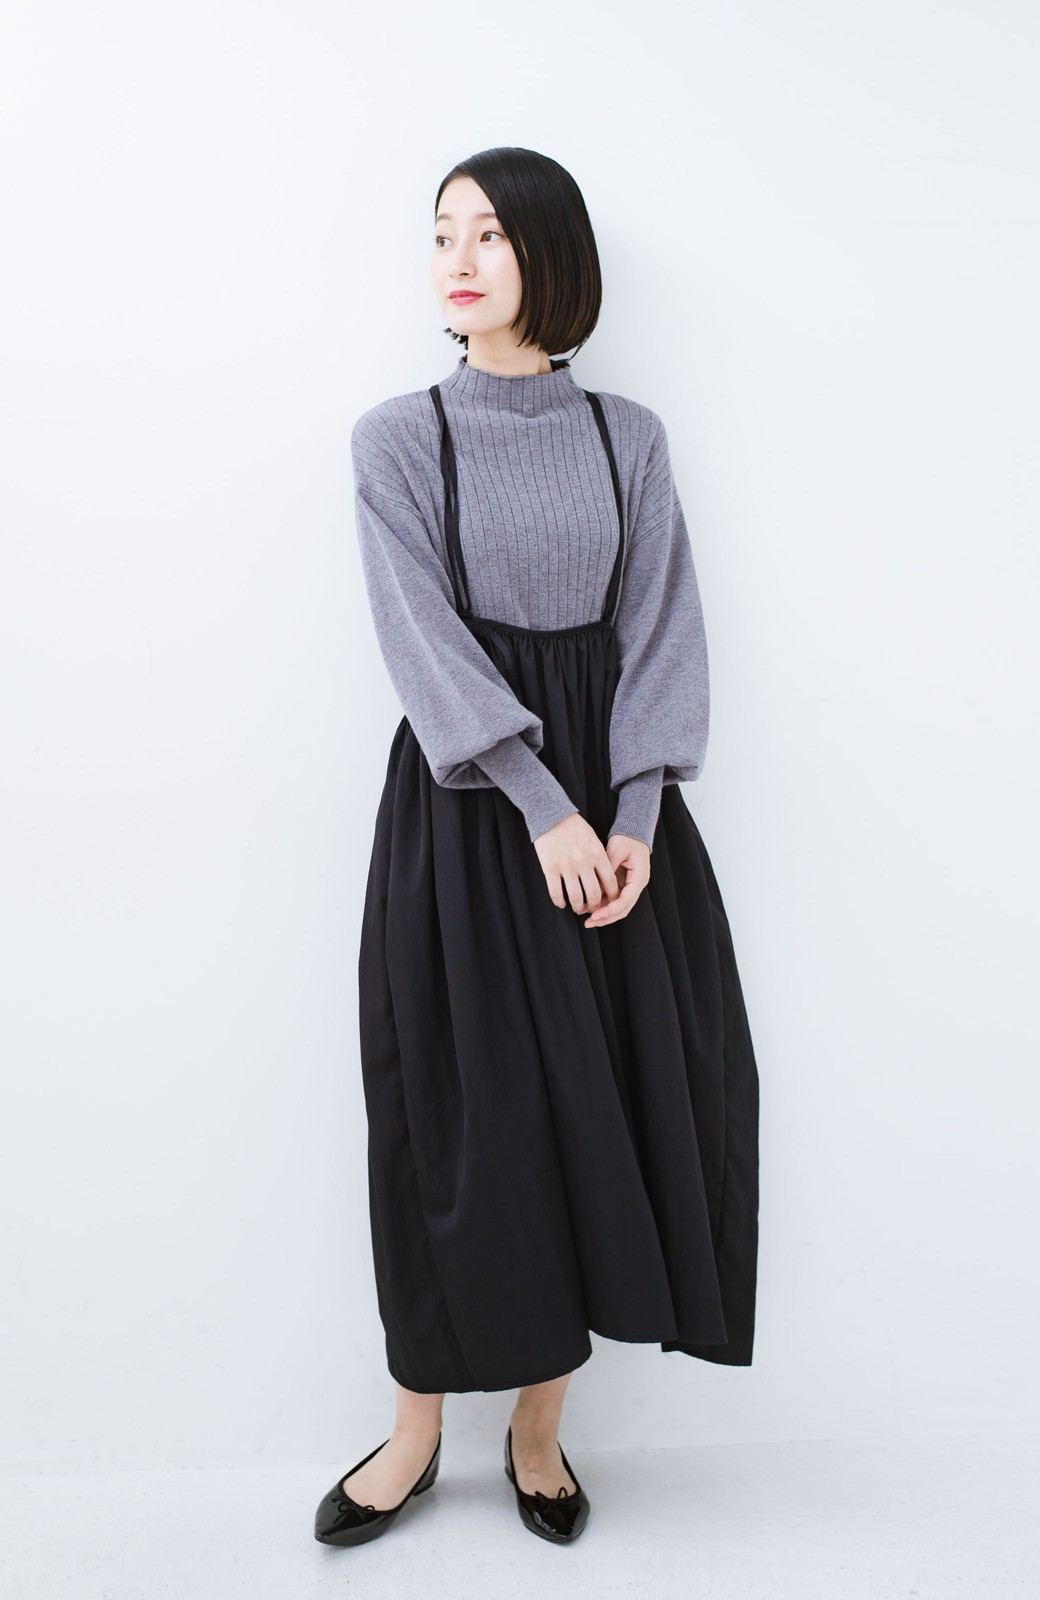 haco! 女の子バンザイ!プロジェクト【ブルー期】 ニットですら重ね着できる安心さ ゆったりギャザーキャミワンピ <ブラック>の商品写真8